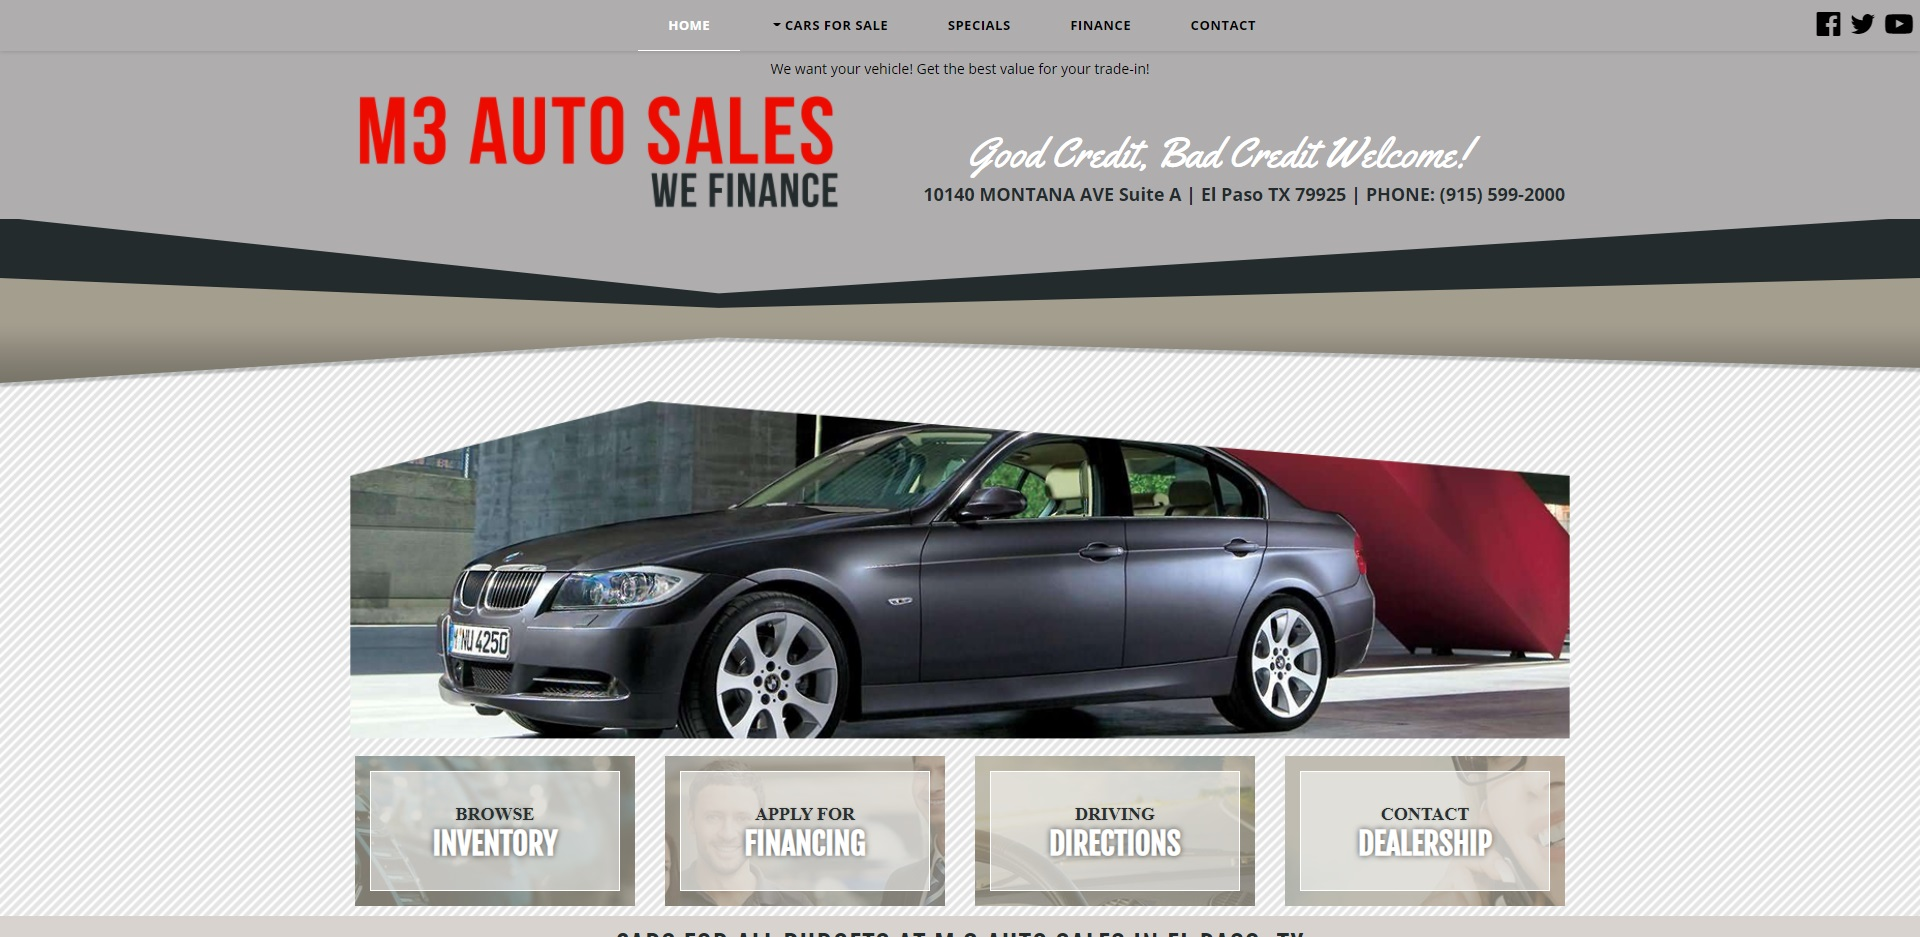 The Best BMW Dealers in El Paso, TX